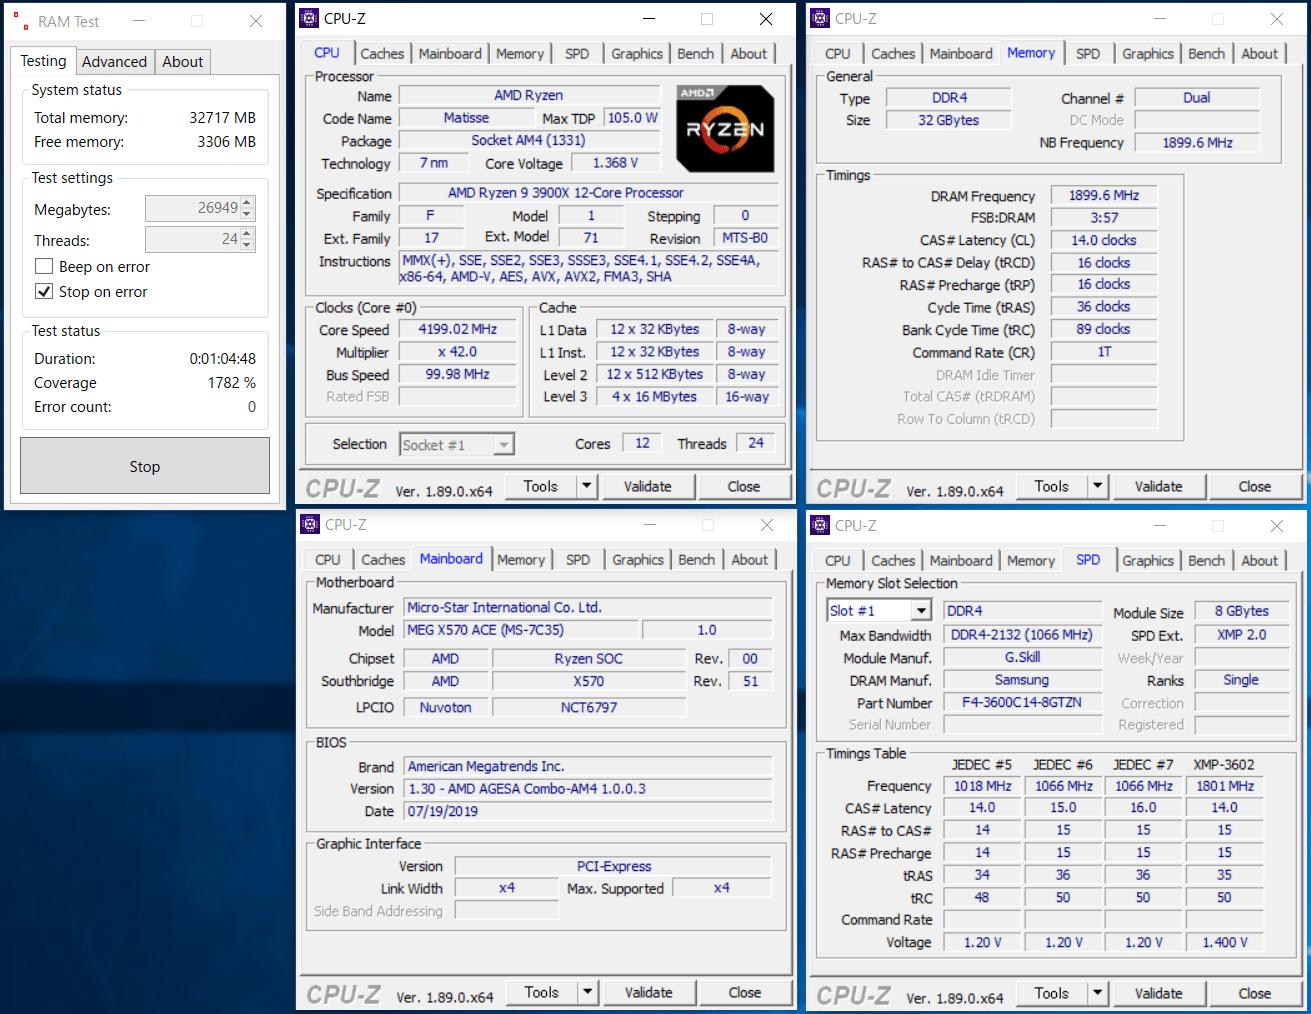 G.Skill Trident Z Neo F4-3600C14Q-32GTZN_3800MHz OC